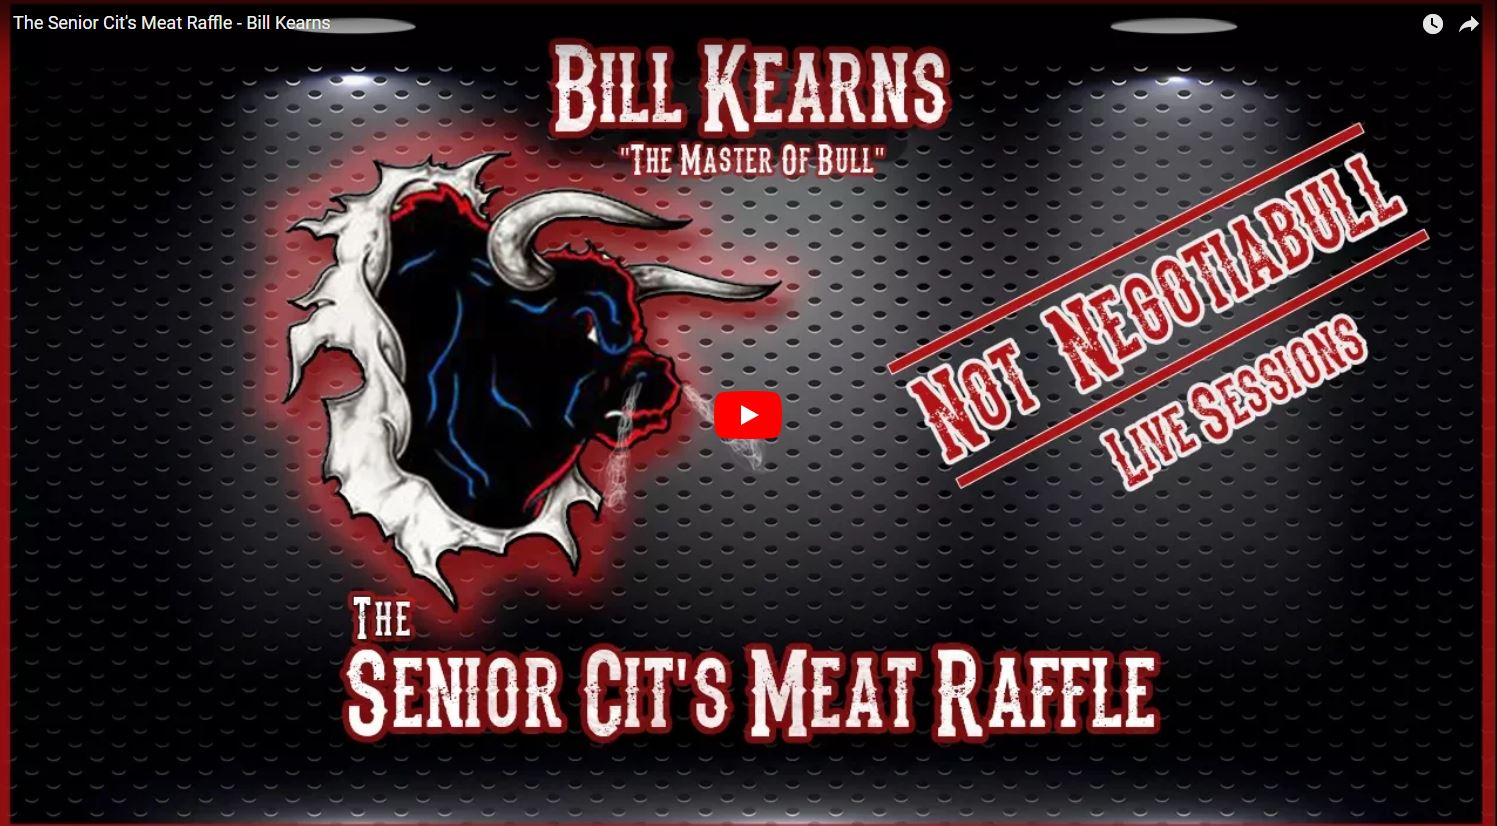 Senior Citizens Meat Raffle